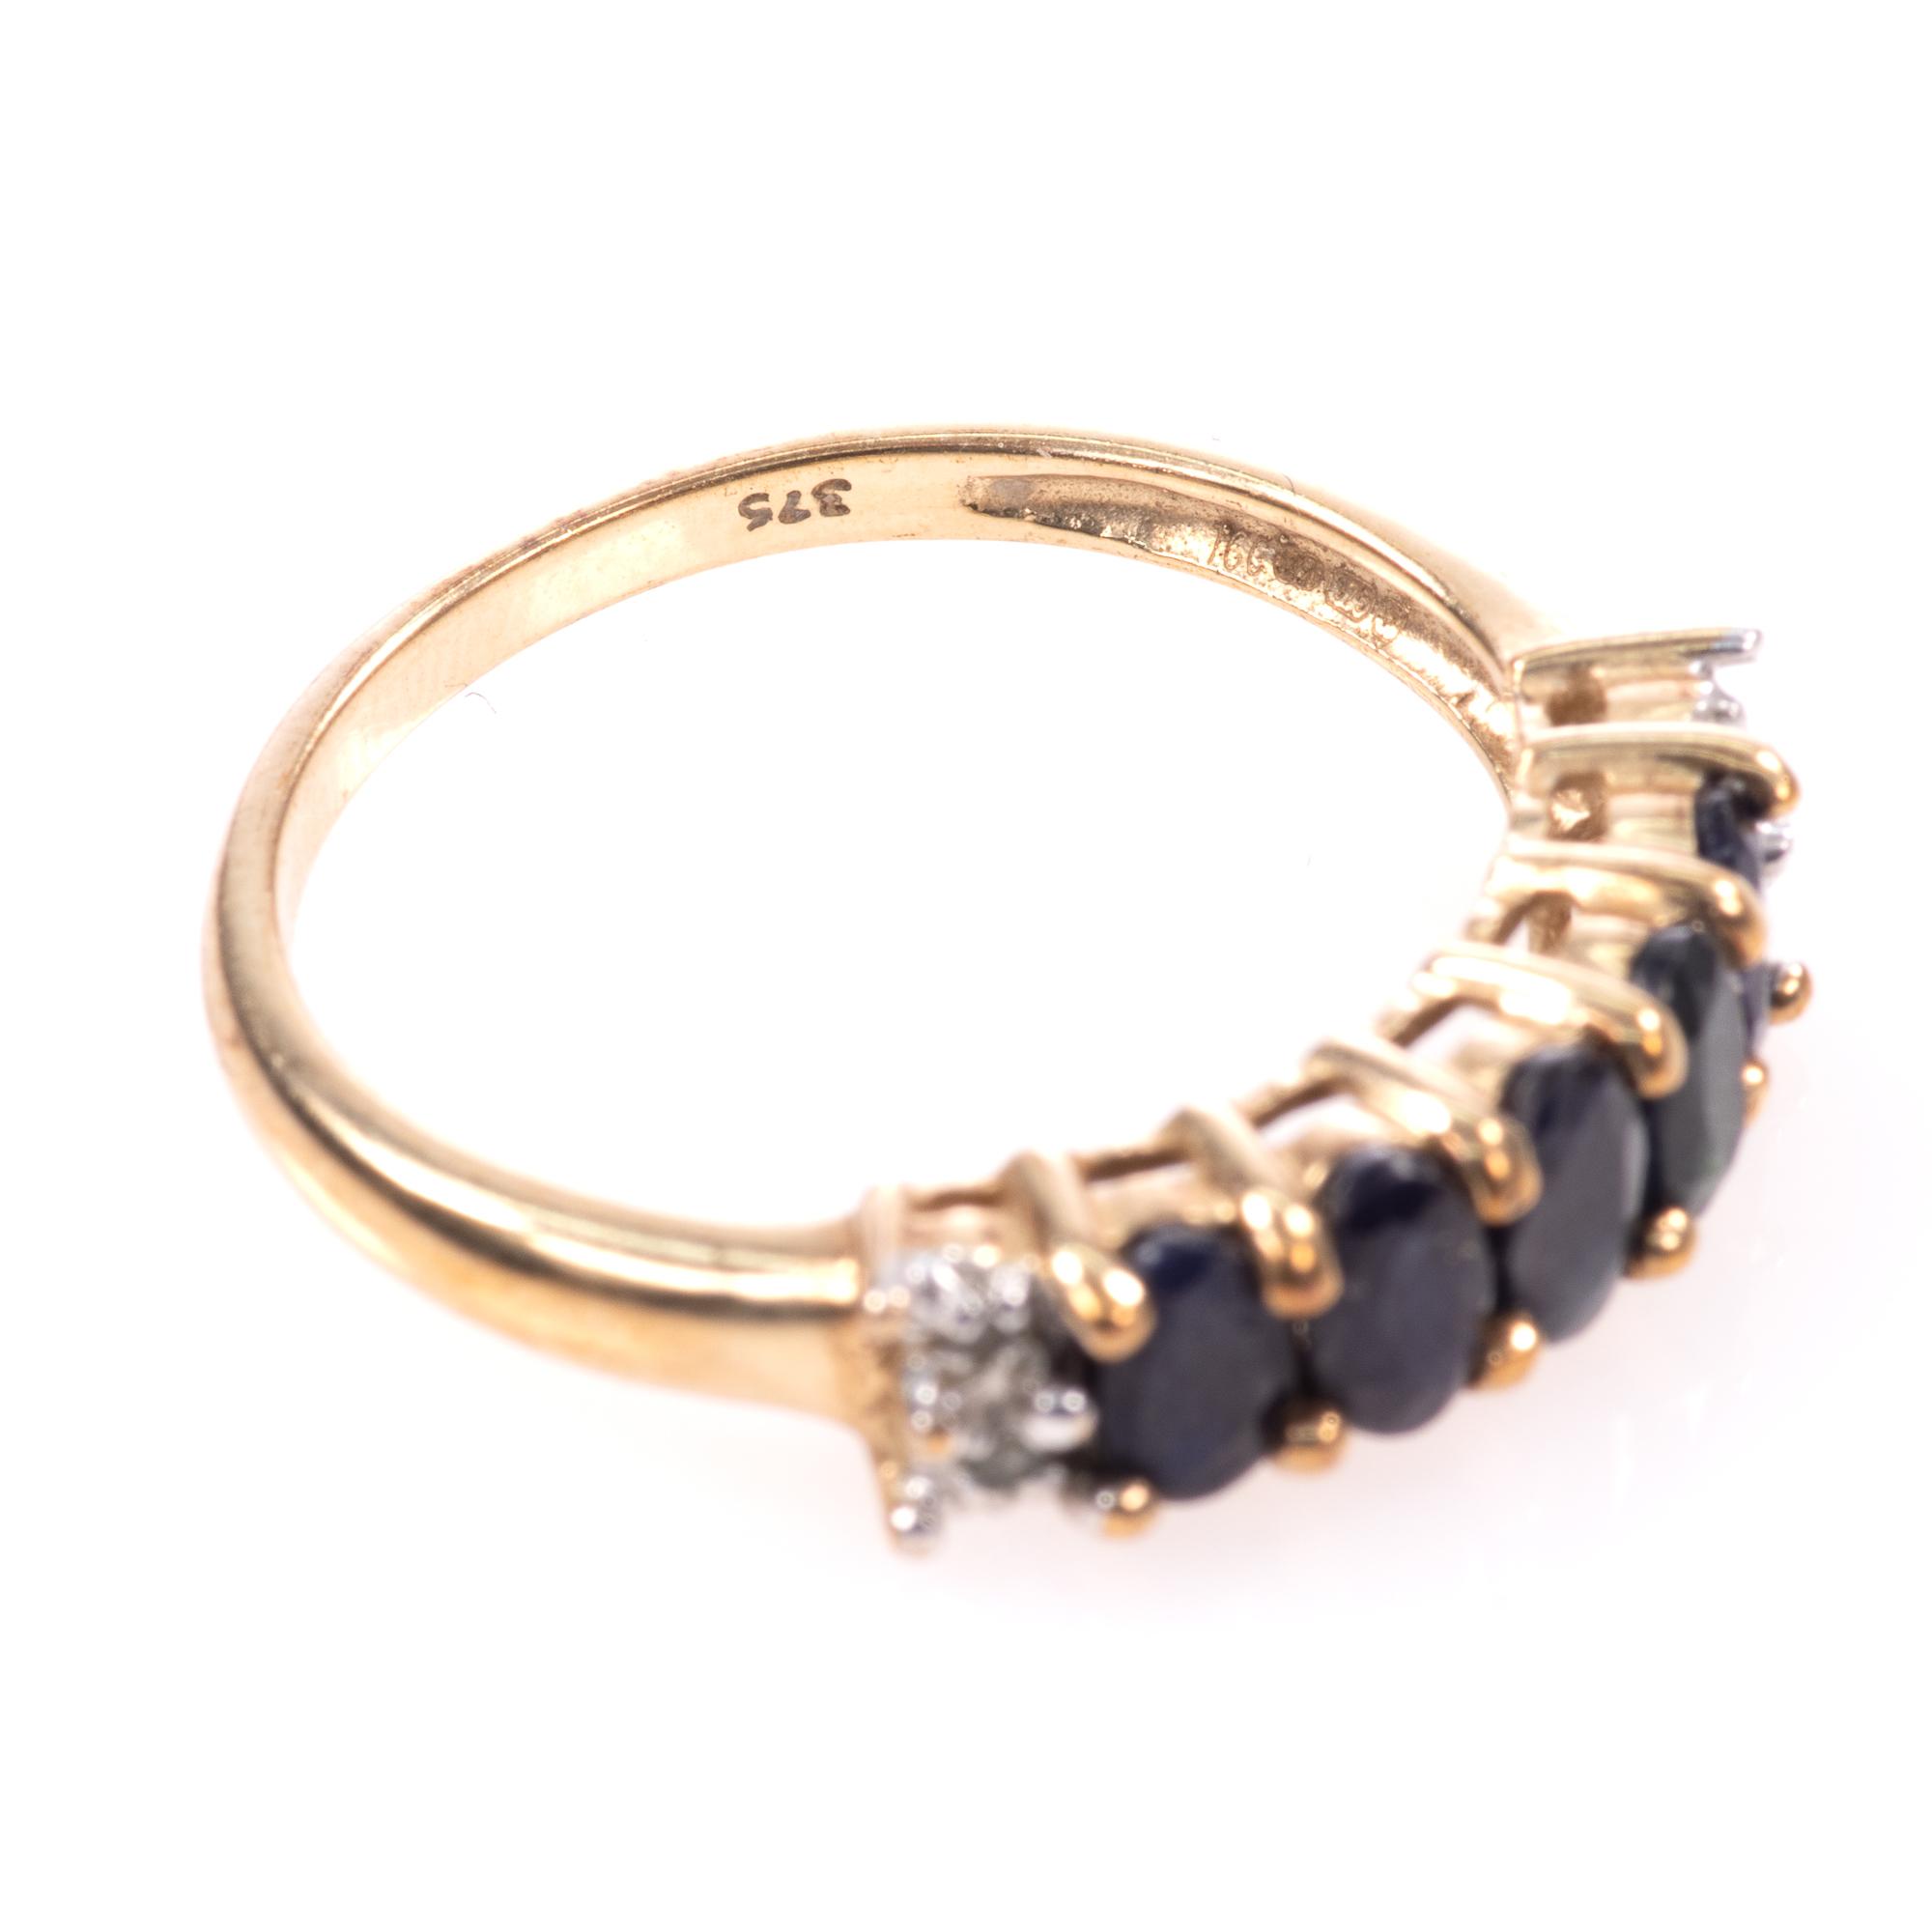 9ct Gold 5ct Sapphire & Diamond Ring - Image 7 of 7